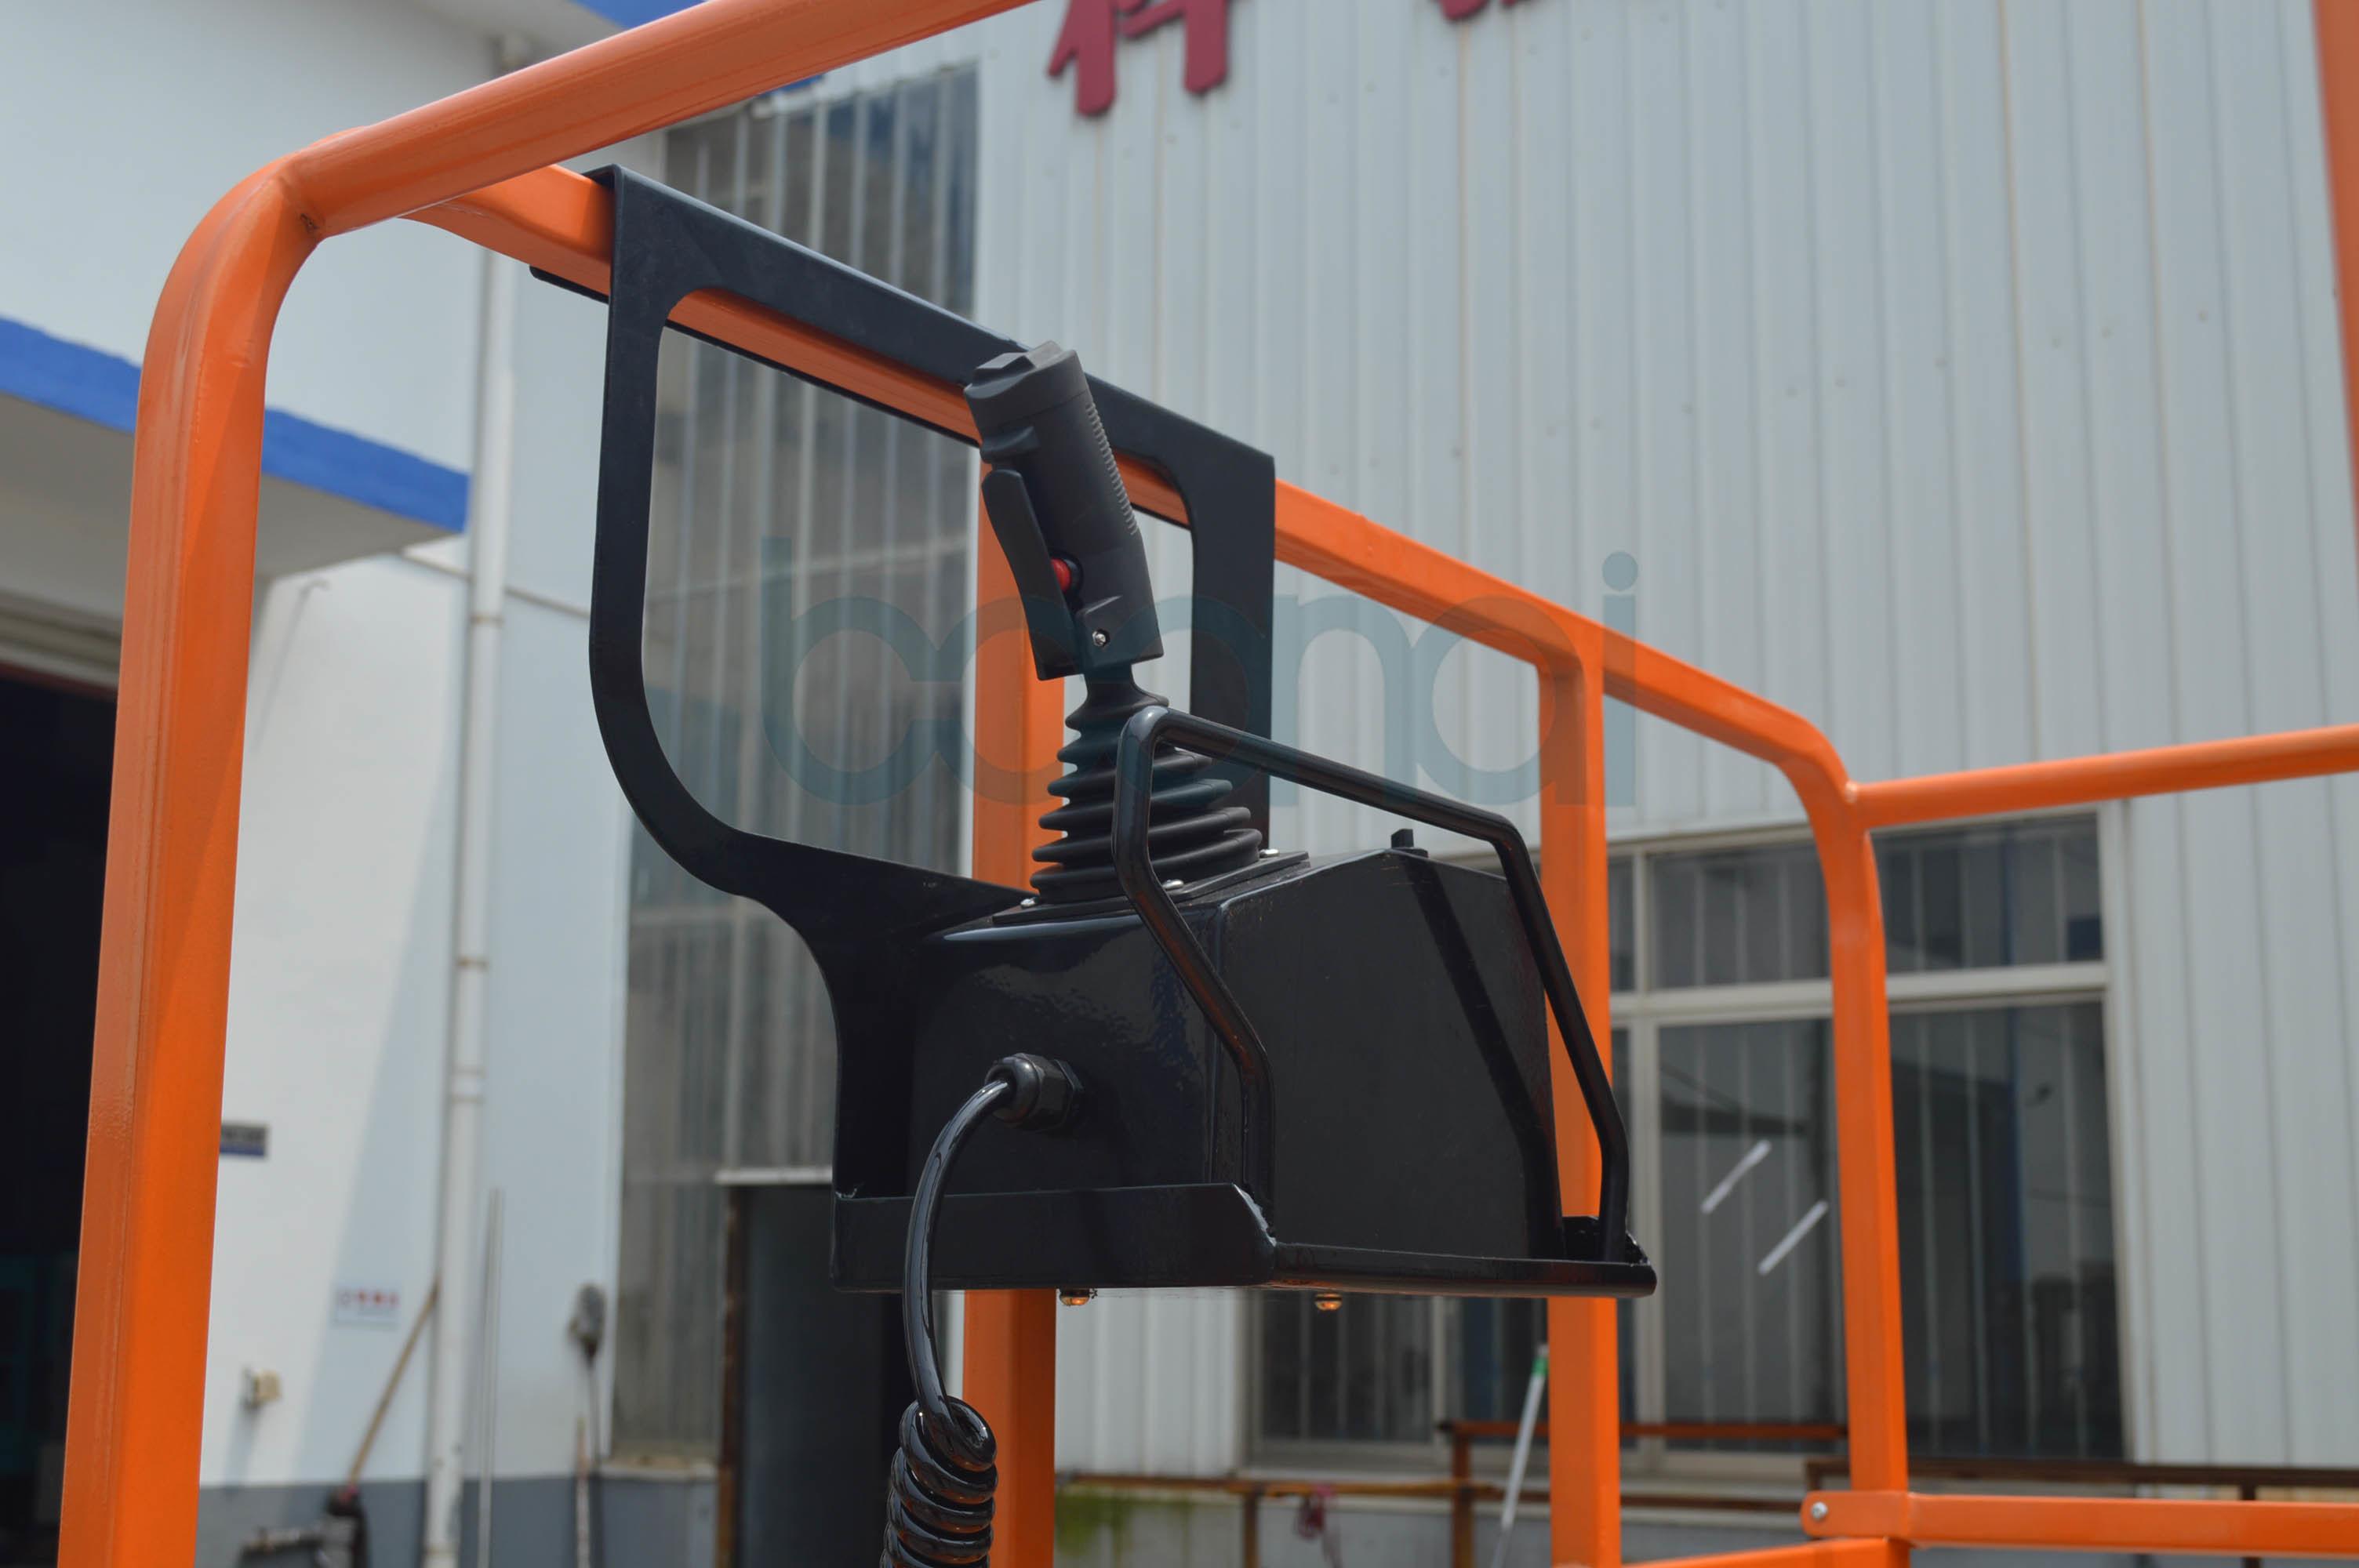 Self-Propelled Mini Scissor Lift (Customized) Max Working Height 5.8 (m)